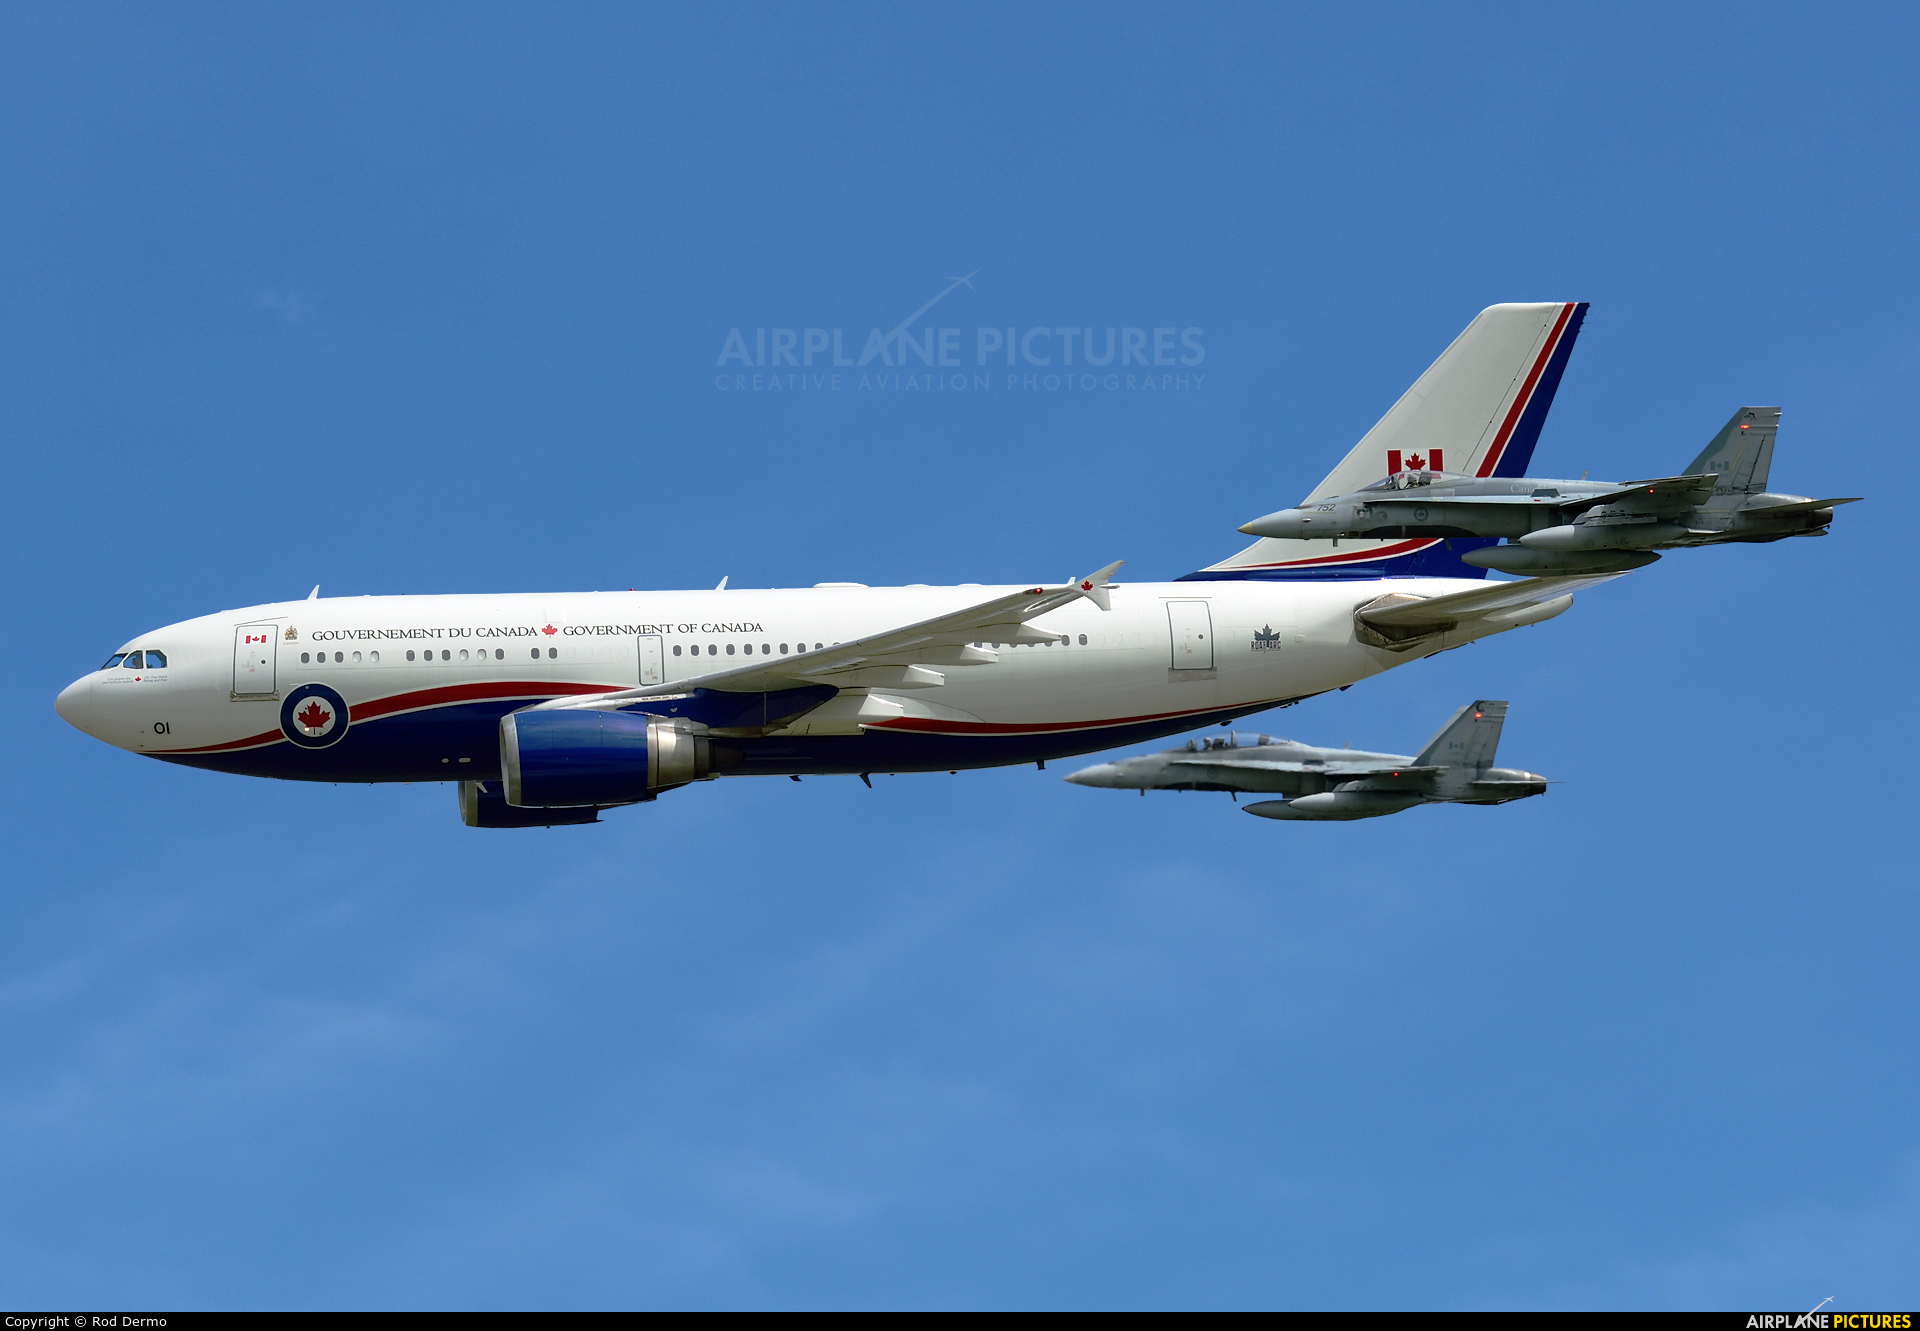 Canada - Air Force 15001 aircraft at London  Intl, ON